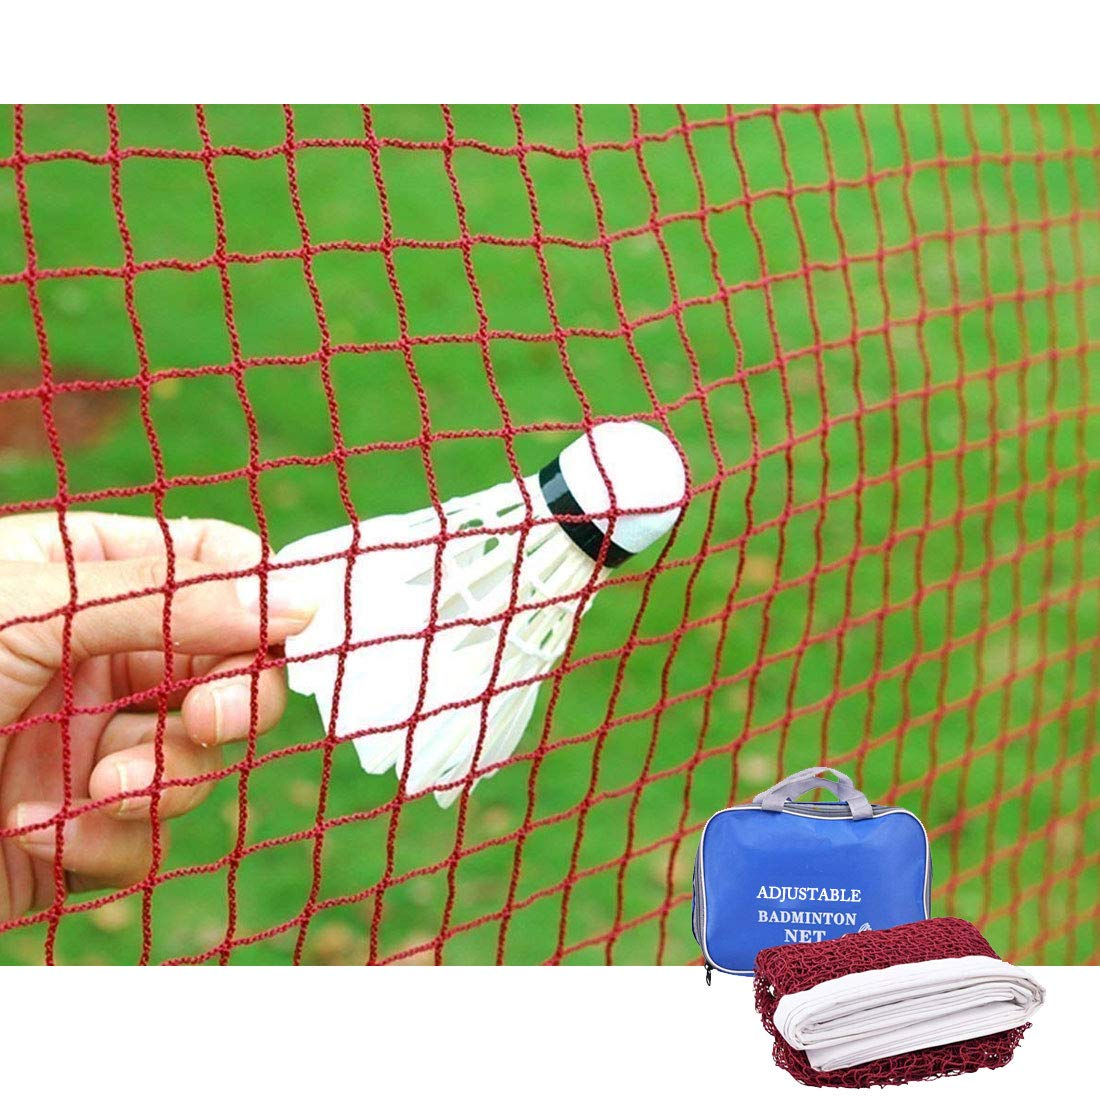 Nuevo Pensamiento tenis bádminton neto ajustable plegable estándar internacional grande 20en New thinking